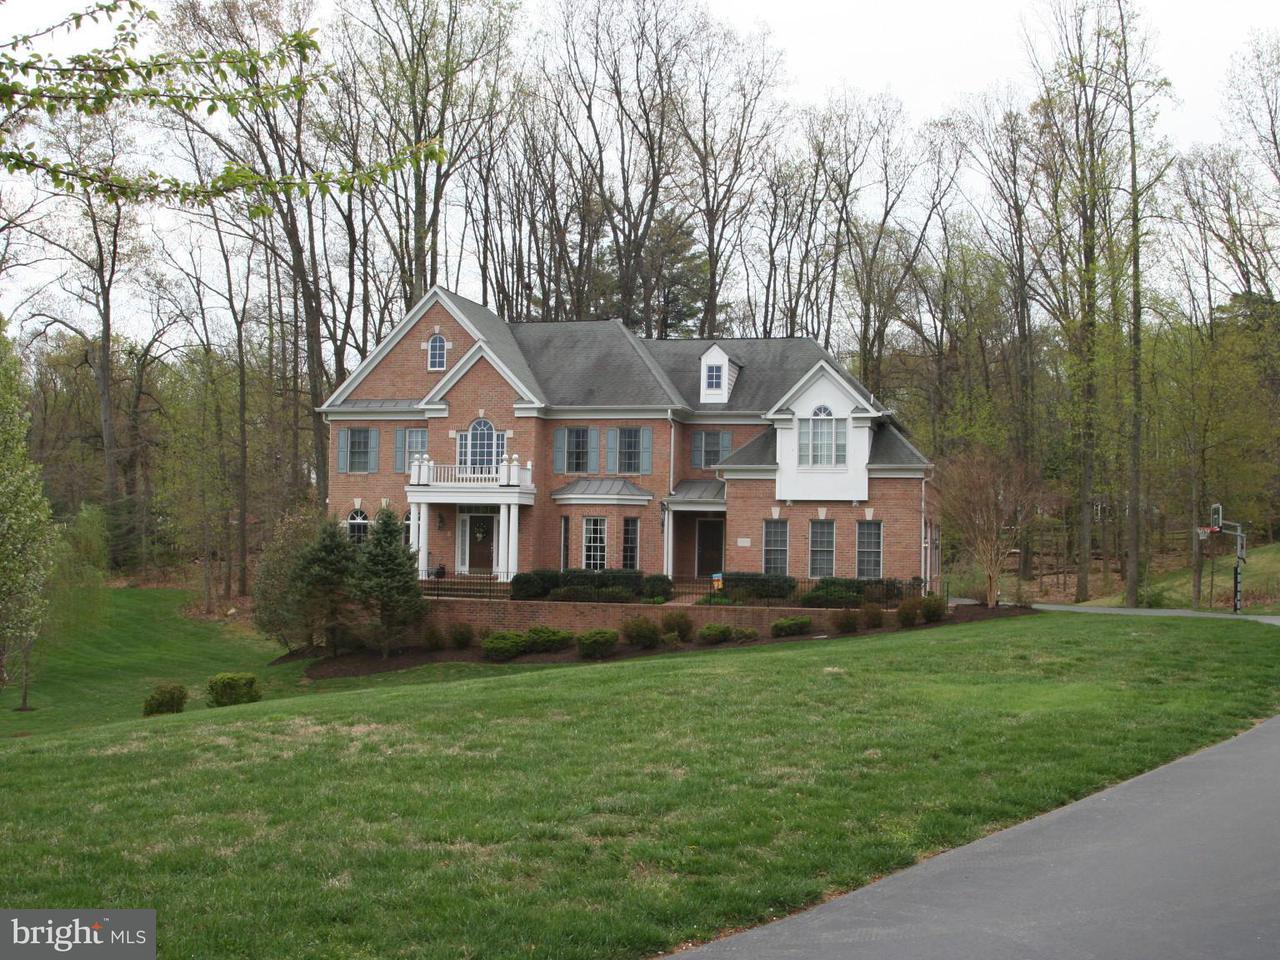 Single Family Home for Sale at 11305 Walnut Creek Court 11305 Walnut Creek Court Oakton, Virginia 22124 United States